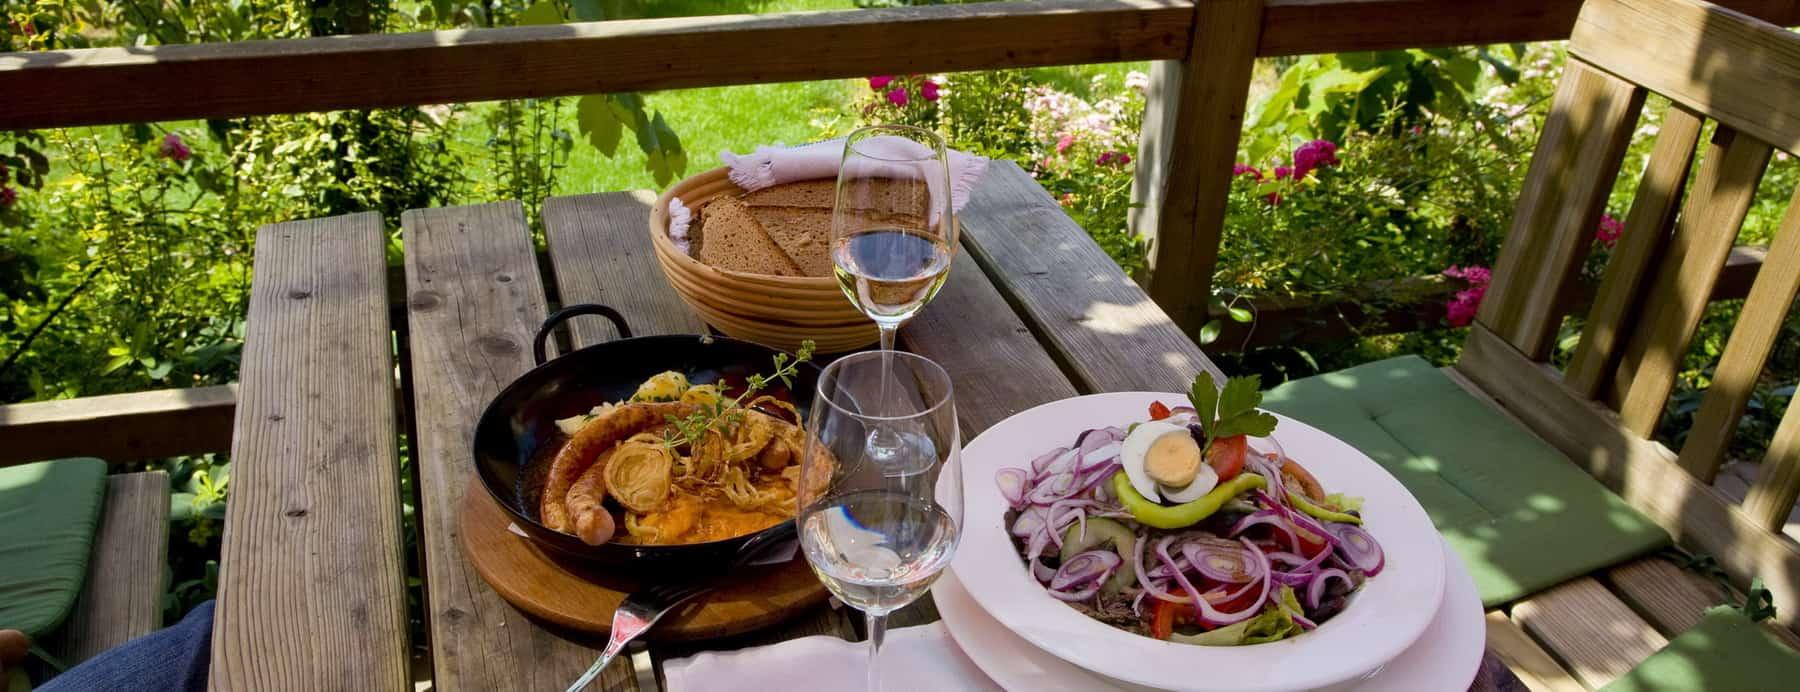 Riegersburg Weinhof Wippel - Steiermark - Semester i Österrike med Austria Travel